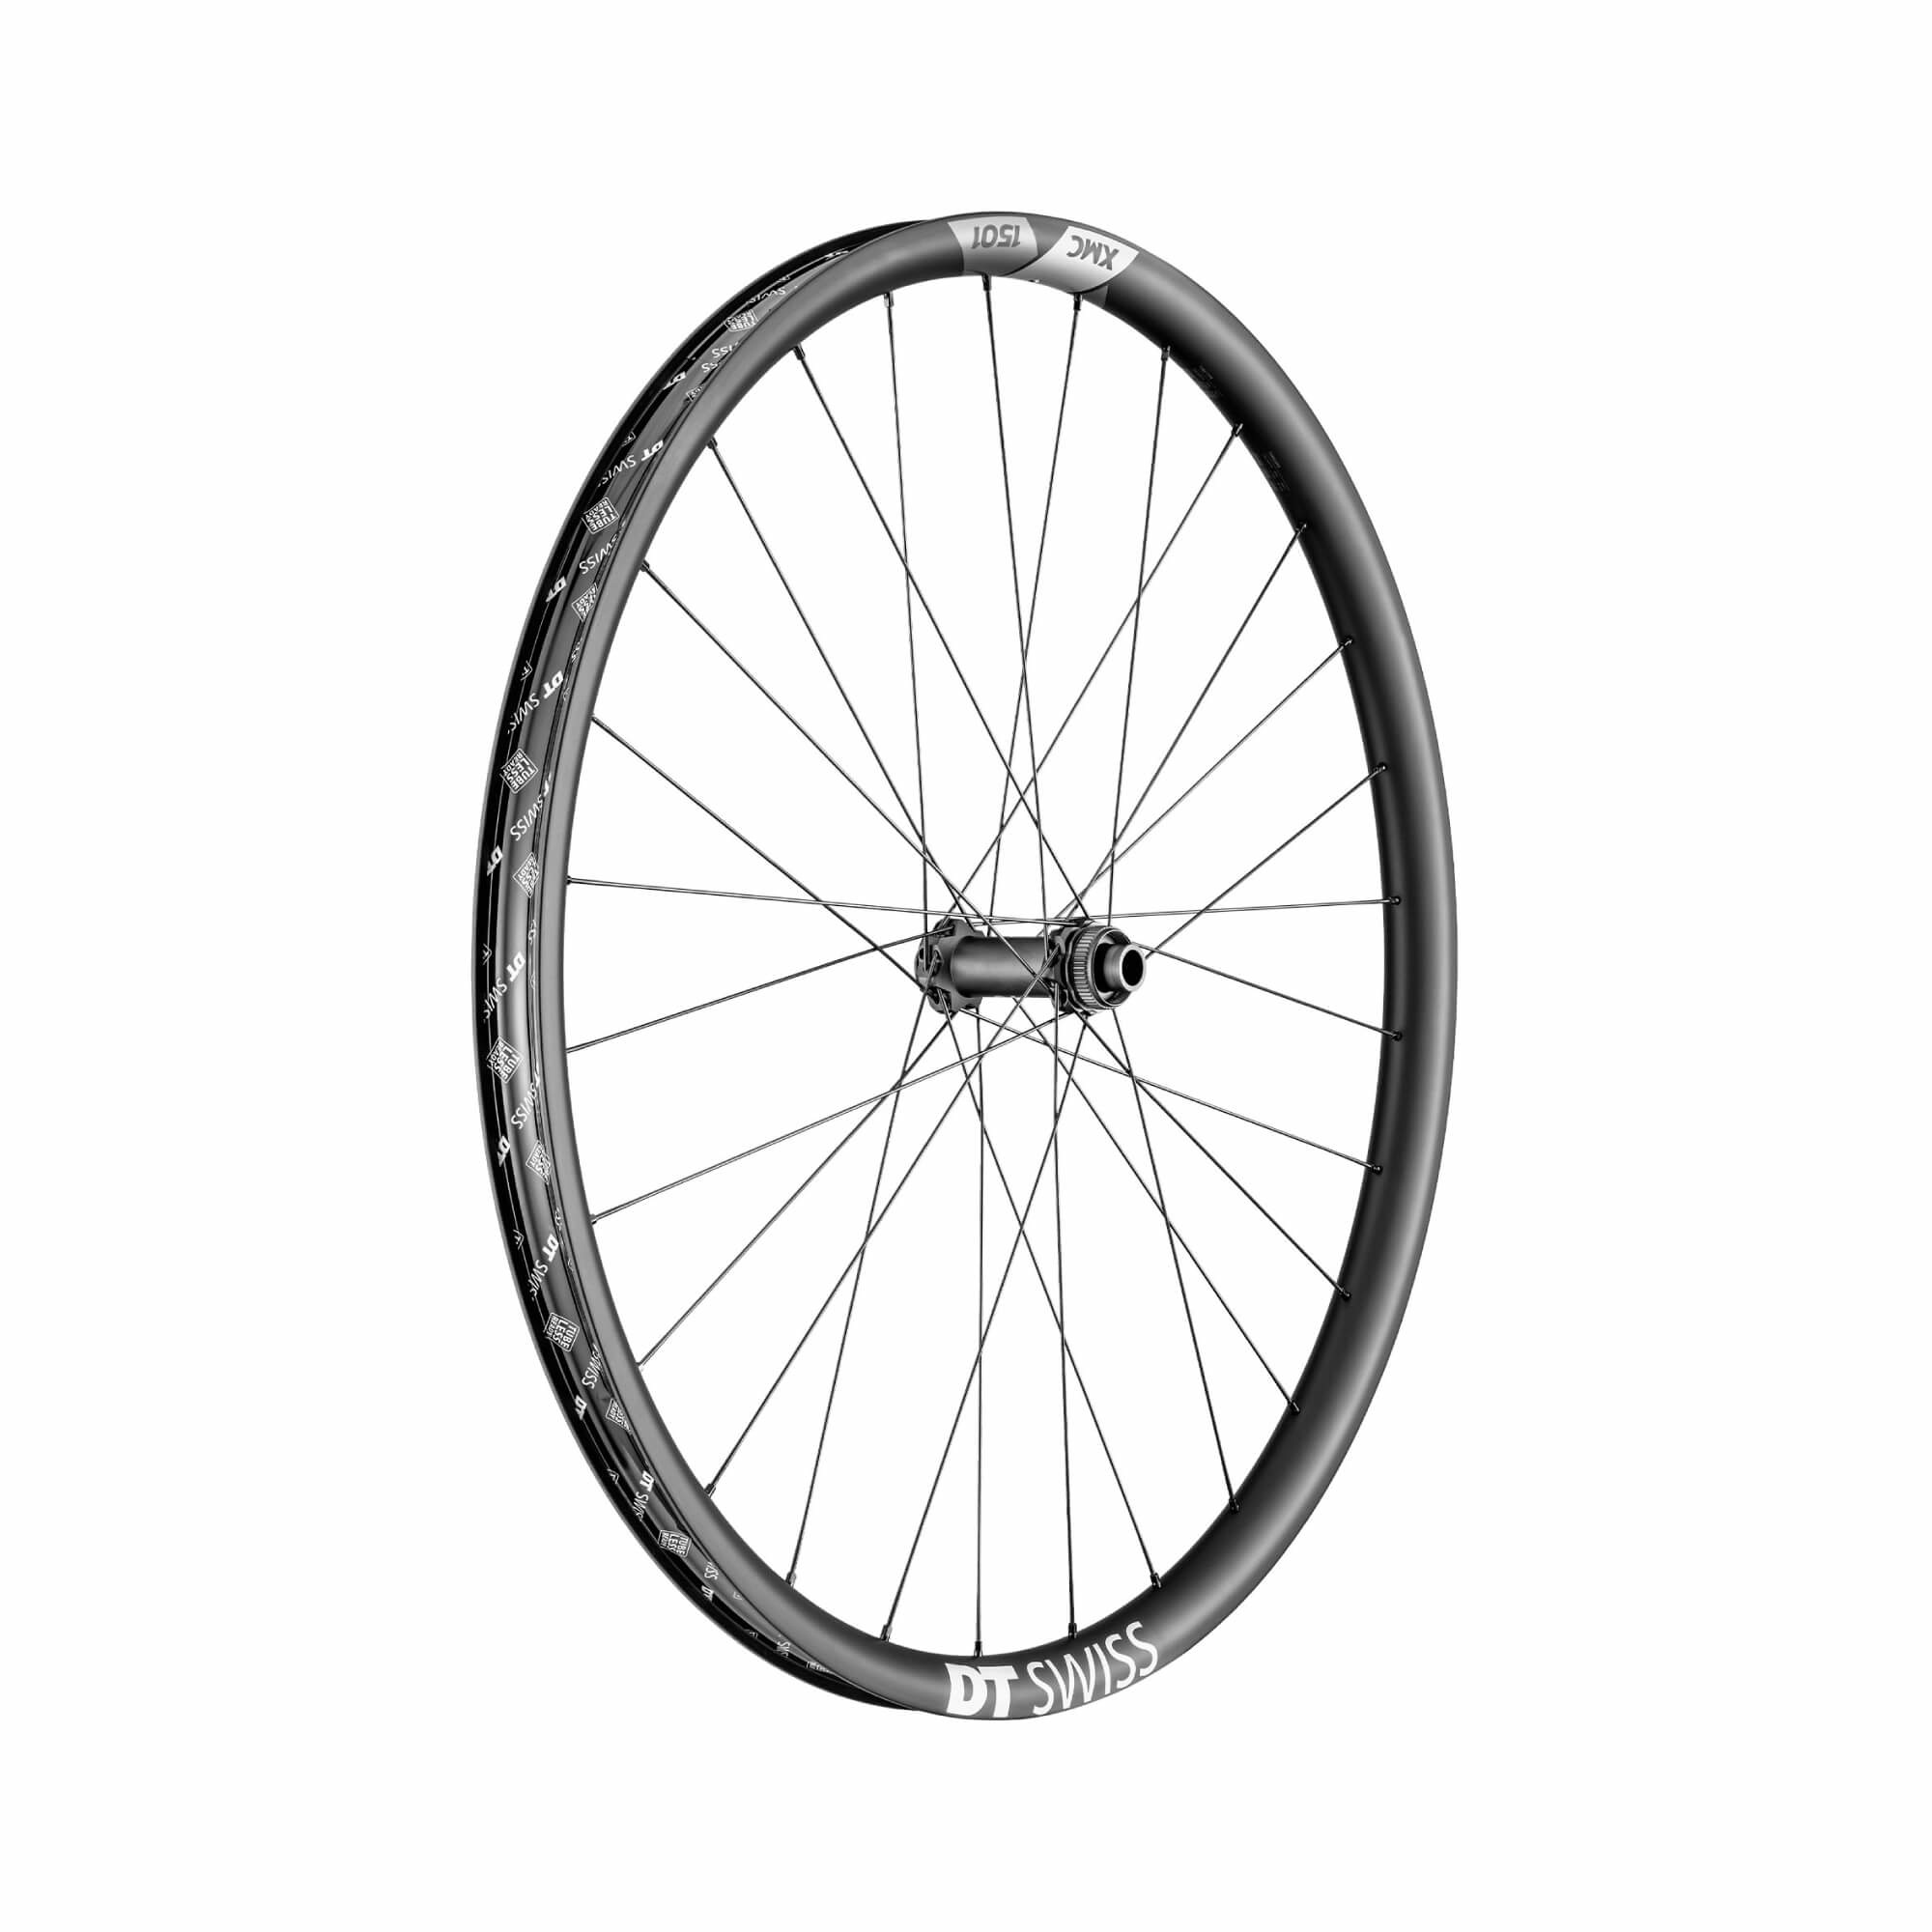 XMC1501 29 Front Wheel 15 x 110mm 30wd CL/6B MY21-1